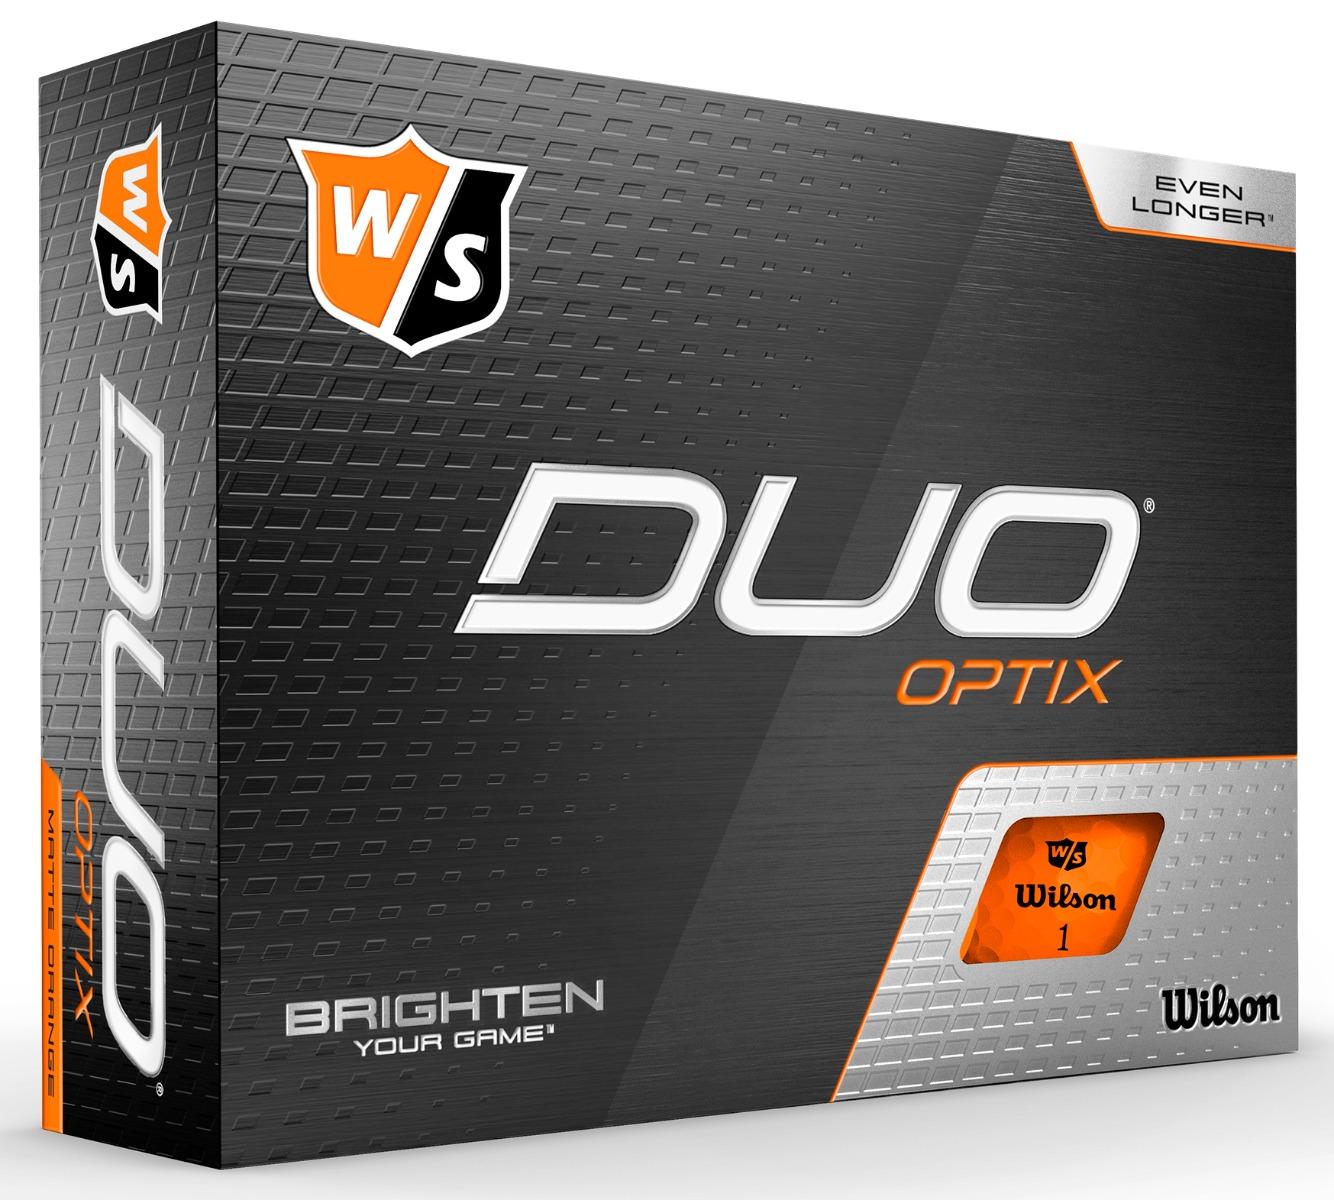 https://www.best4sportsballs.com/pub/media/catalog/product/d/u/duo_optix_orange_box_600.jpg